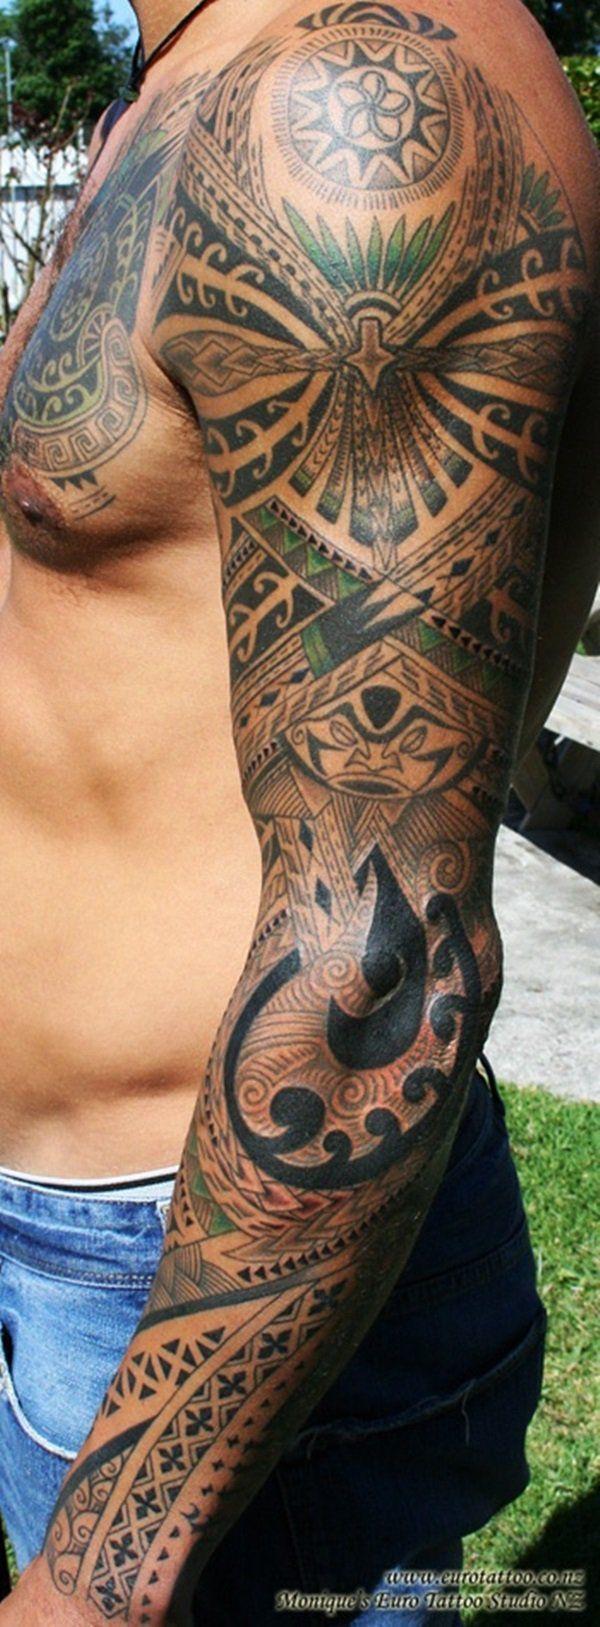 70 awesome tribal tattoo designs maori tattoos tribal tattoo designs and maori. Black Bedroom Furniture Sets. Home Design Ideas